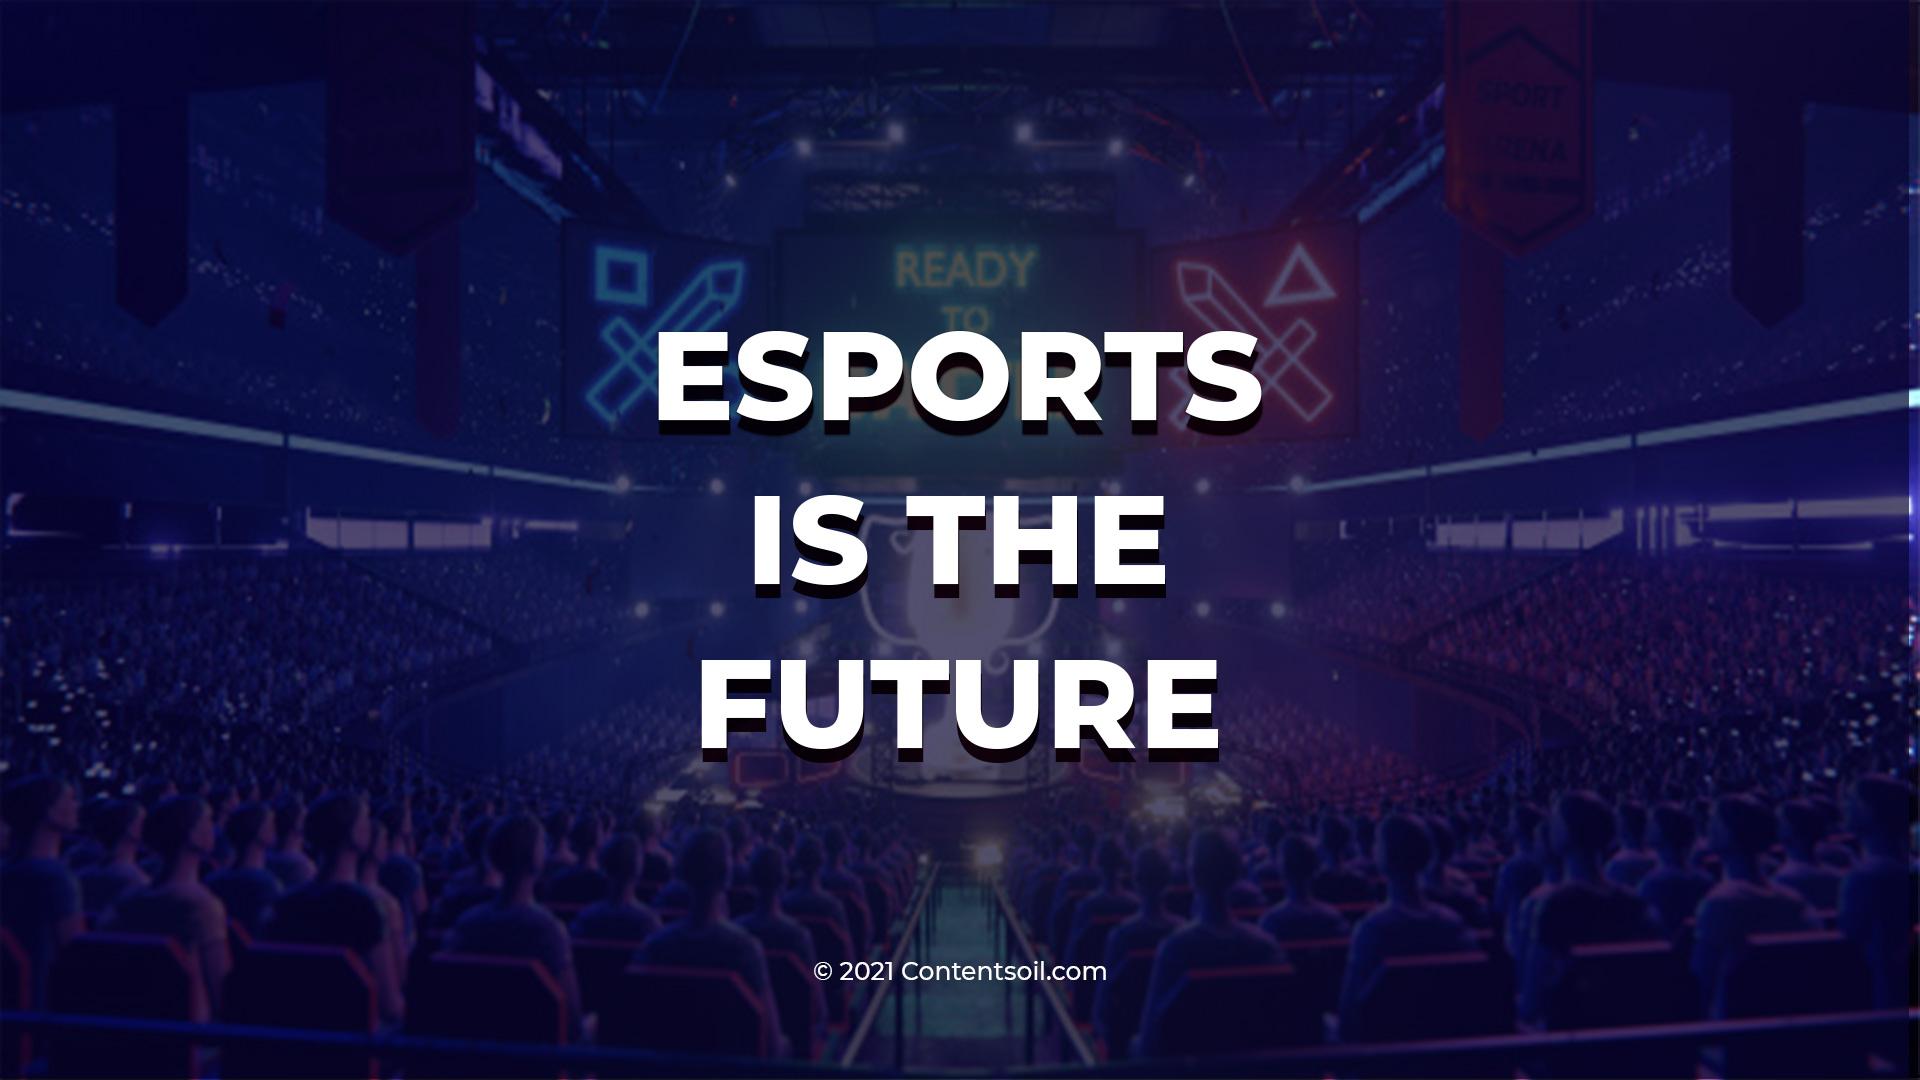 E-sports is the future